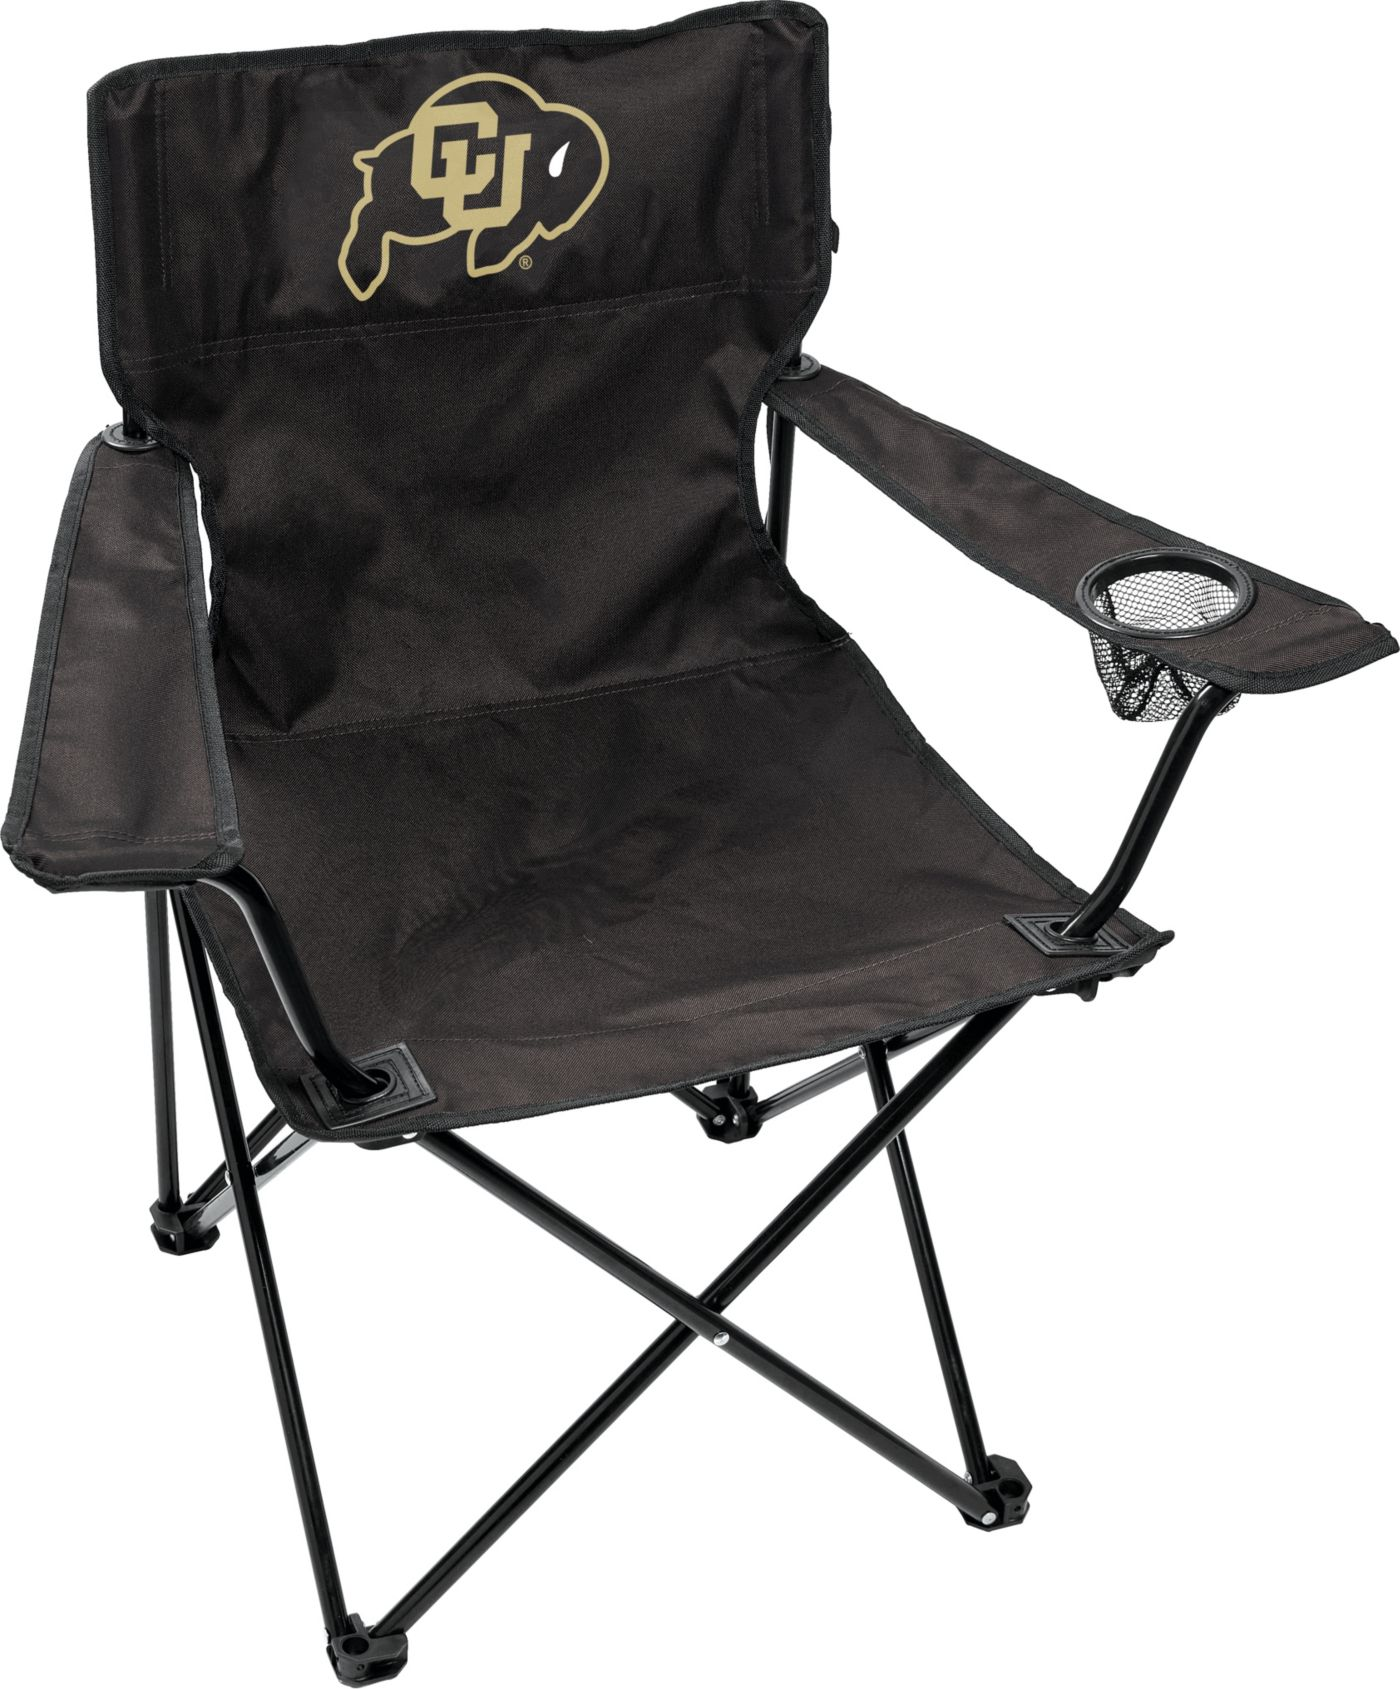 Rawlings Colorado Buffaloes Game Changer Chair